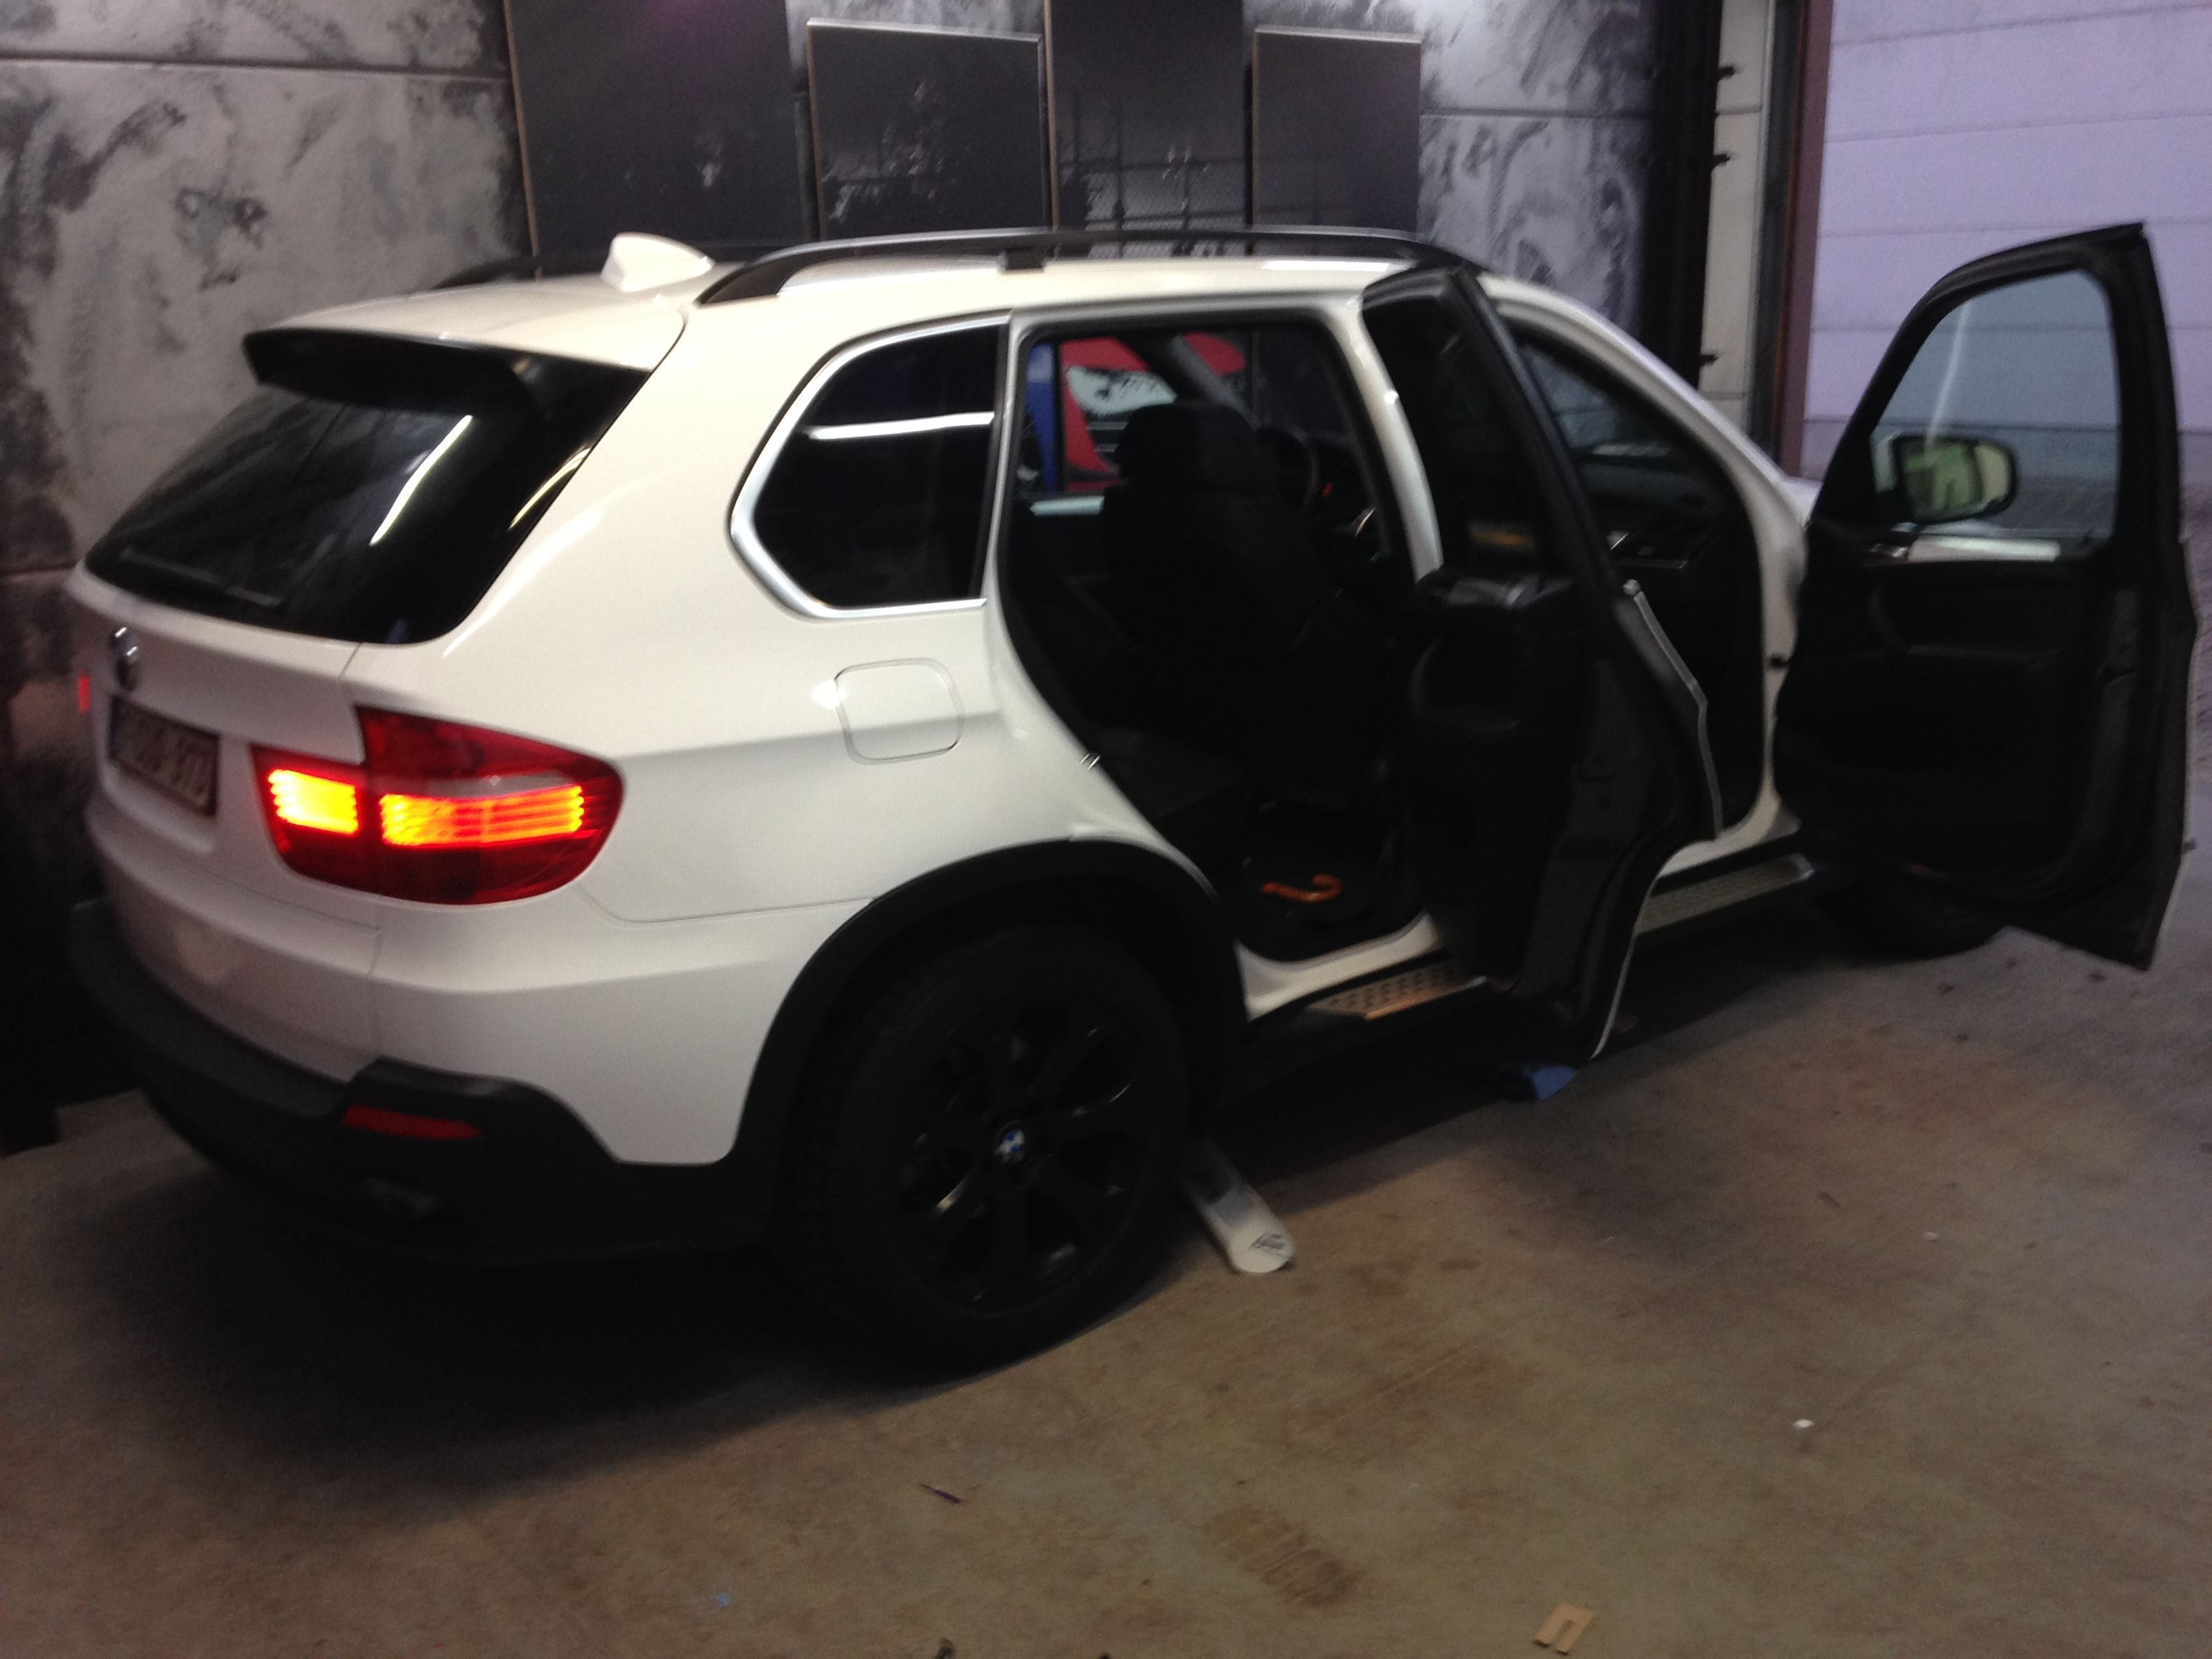 BMW X5 met Glossy White Wrap, Carwrapping door Wrapmyride.nu Foto-nr:5425, ©2021